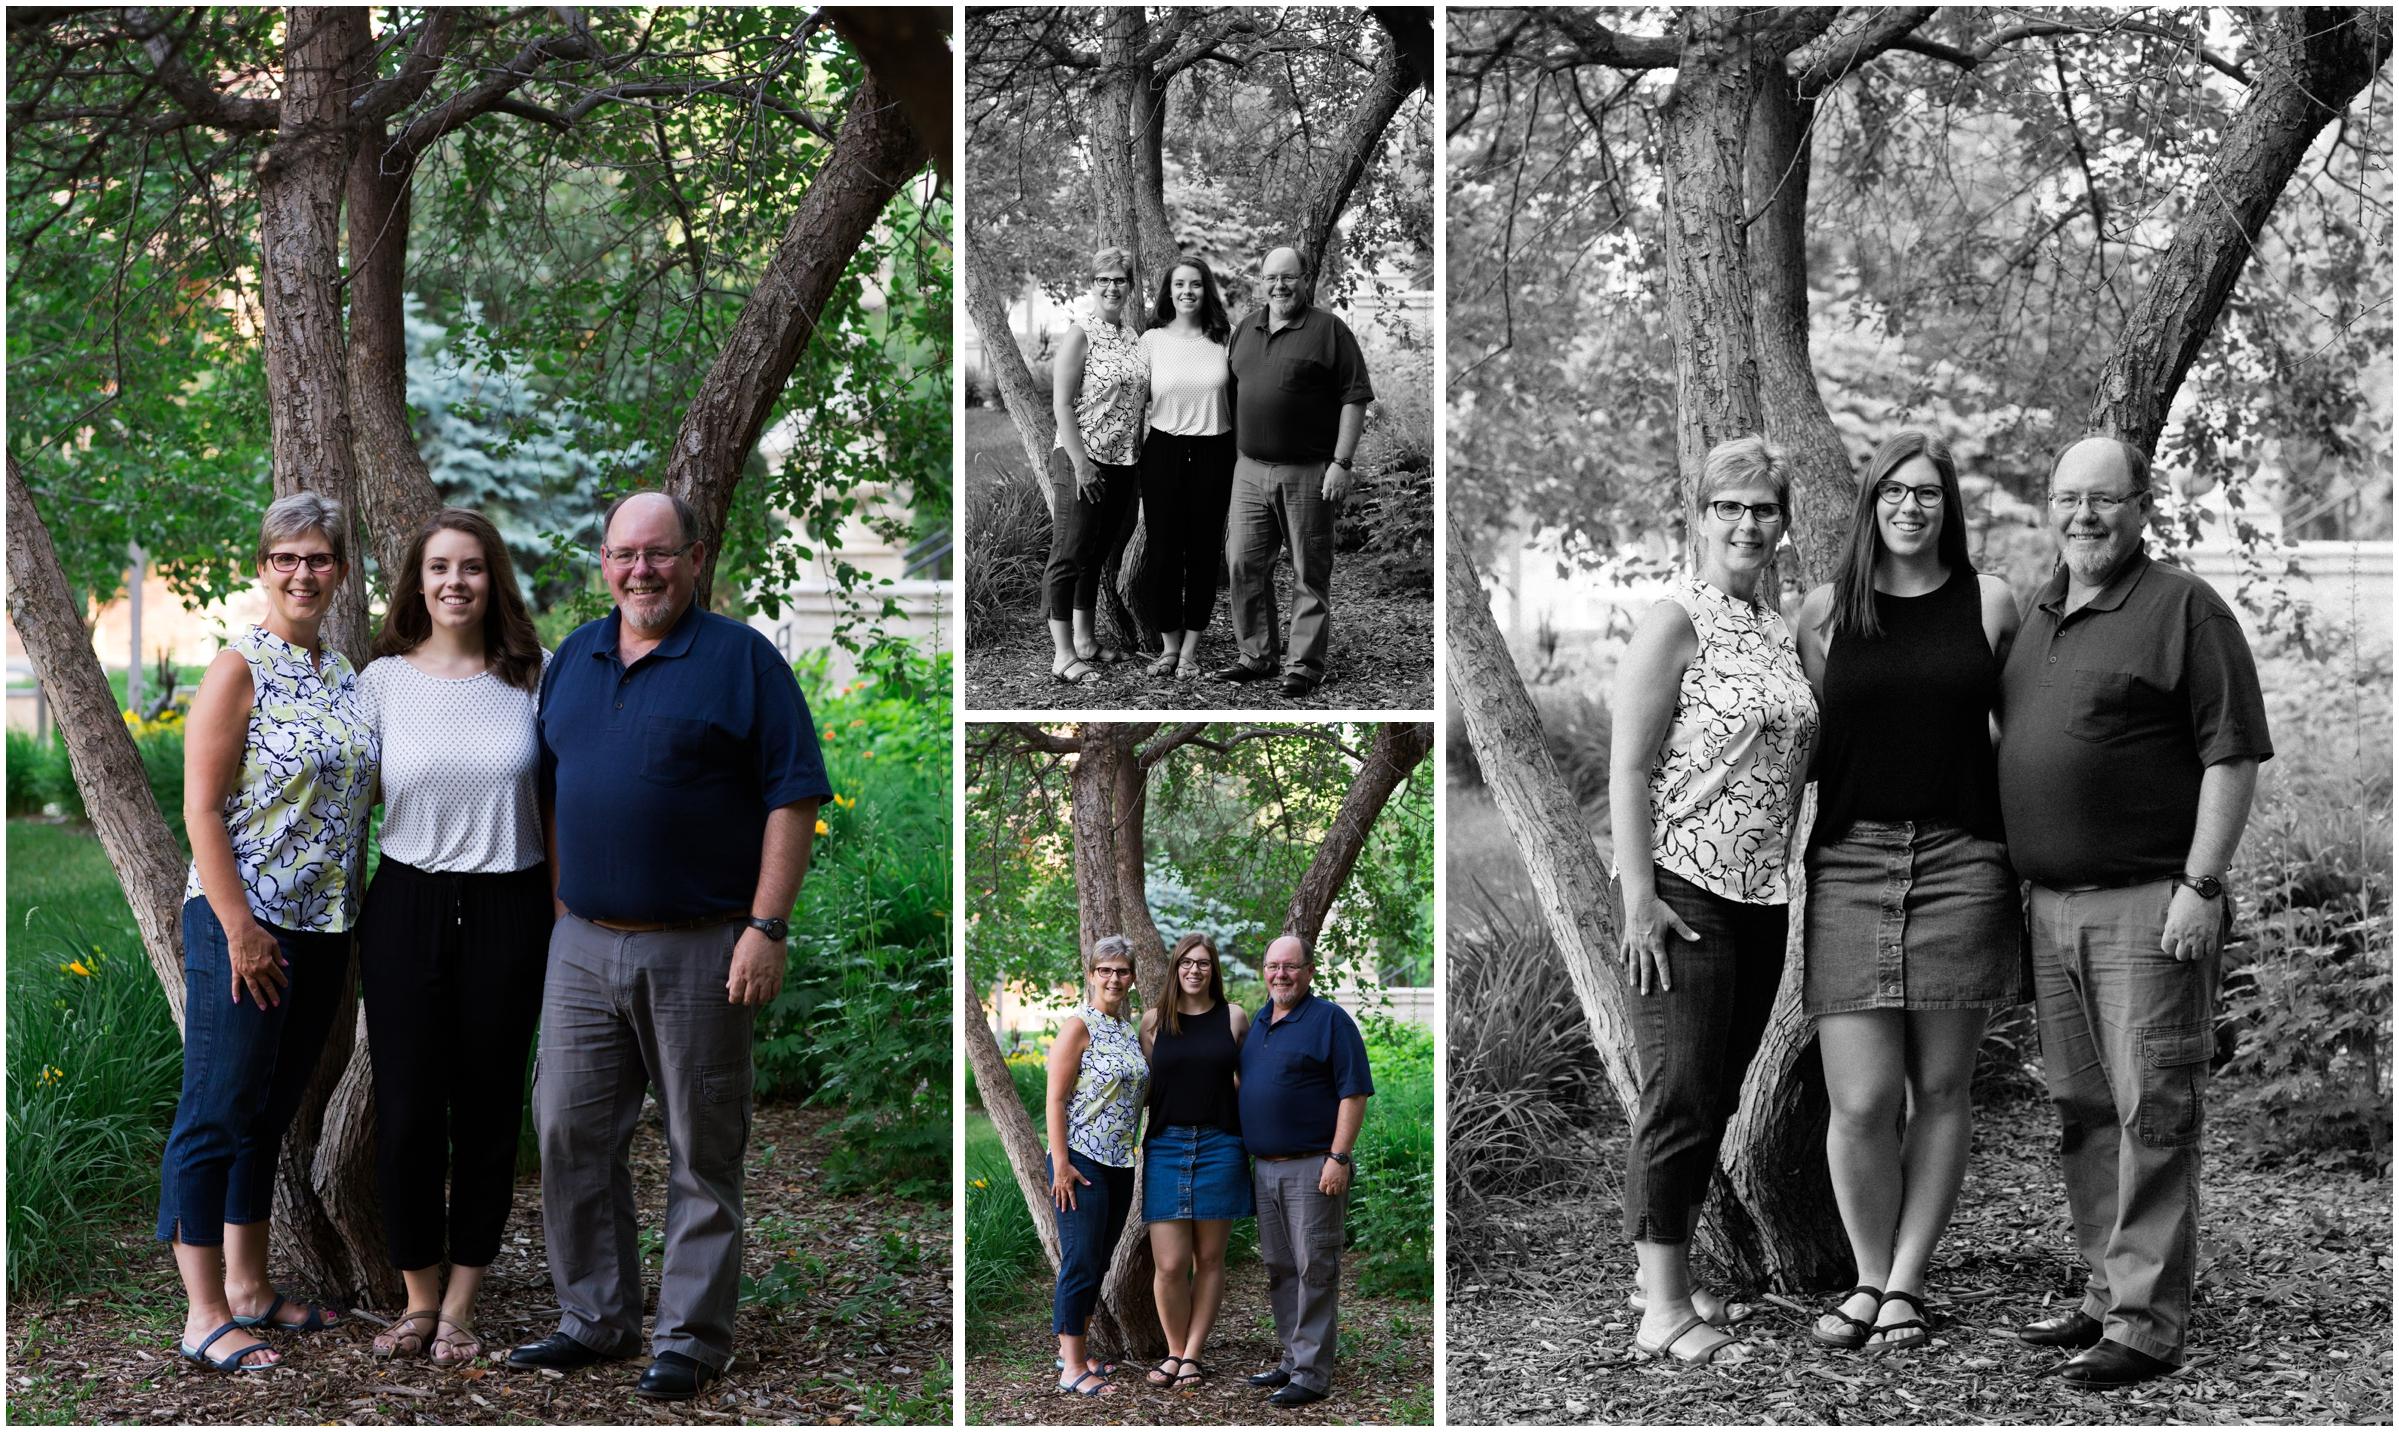 Edmonton Family Photo Session - (Selena Phillips-Boyle)_0024.jpg